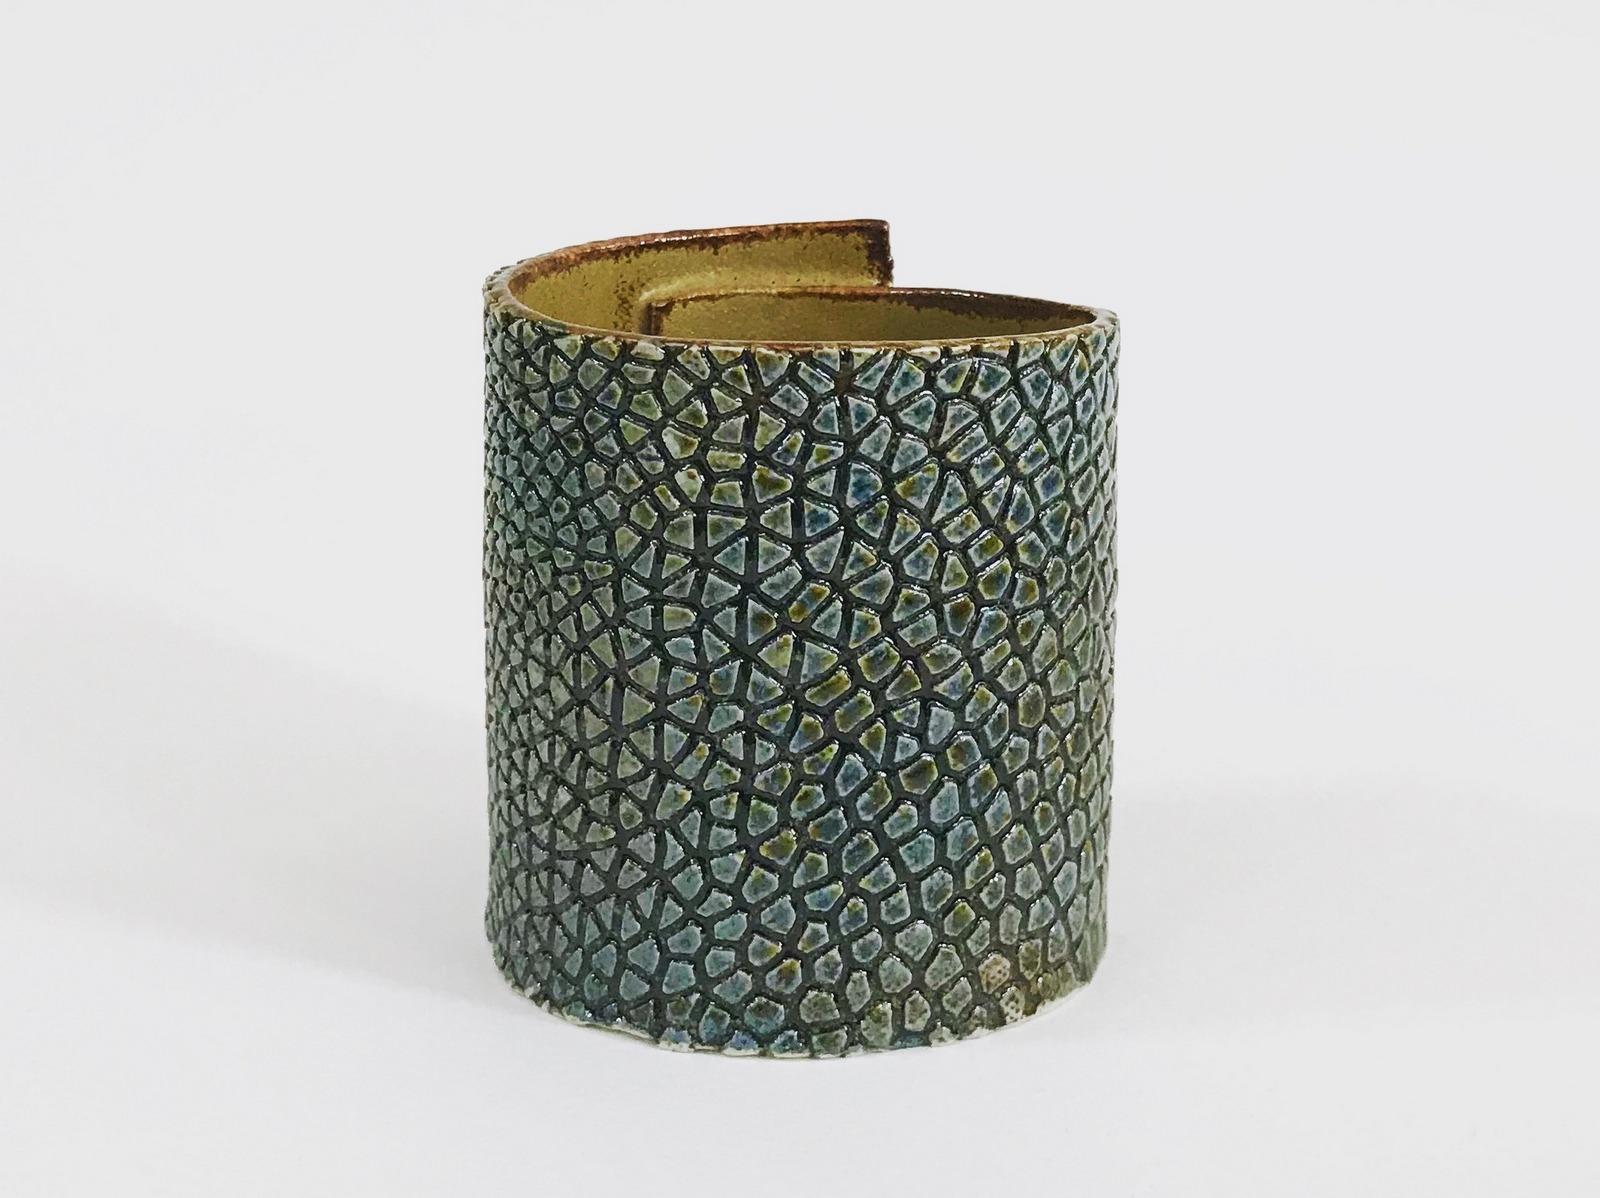 Computational Ceramics